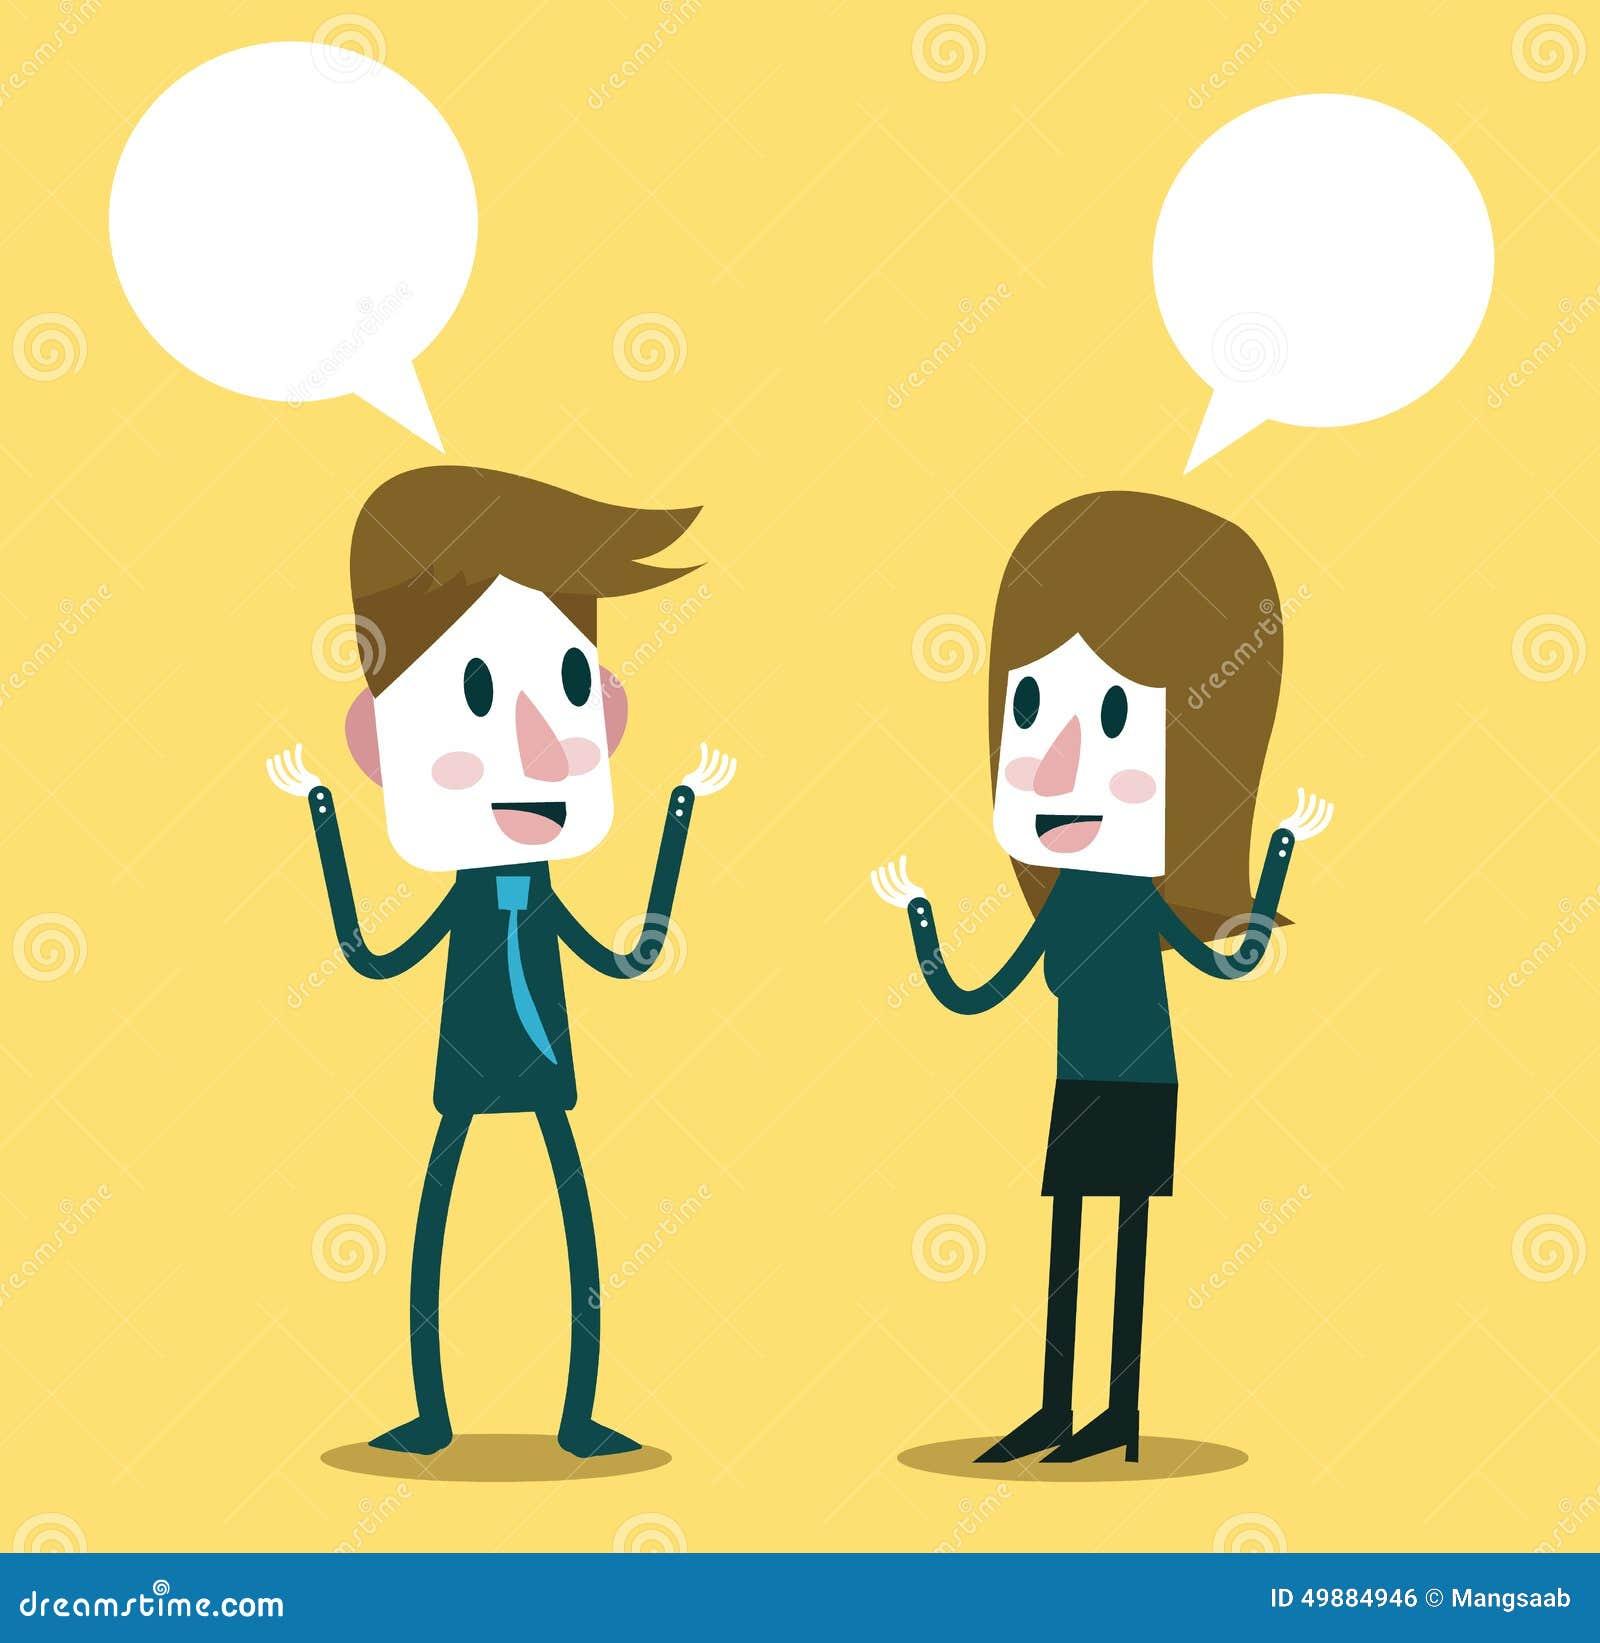 Business Idea Exchange